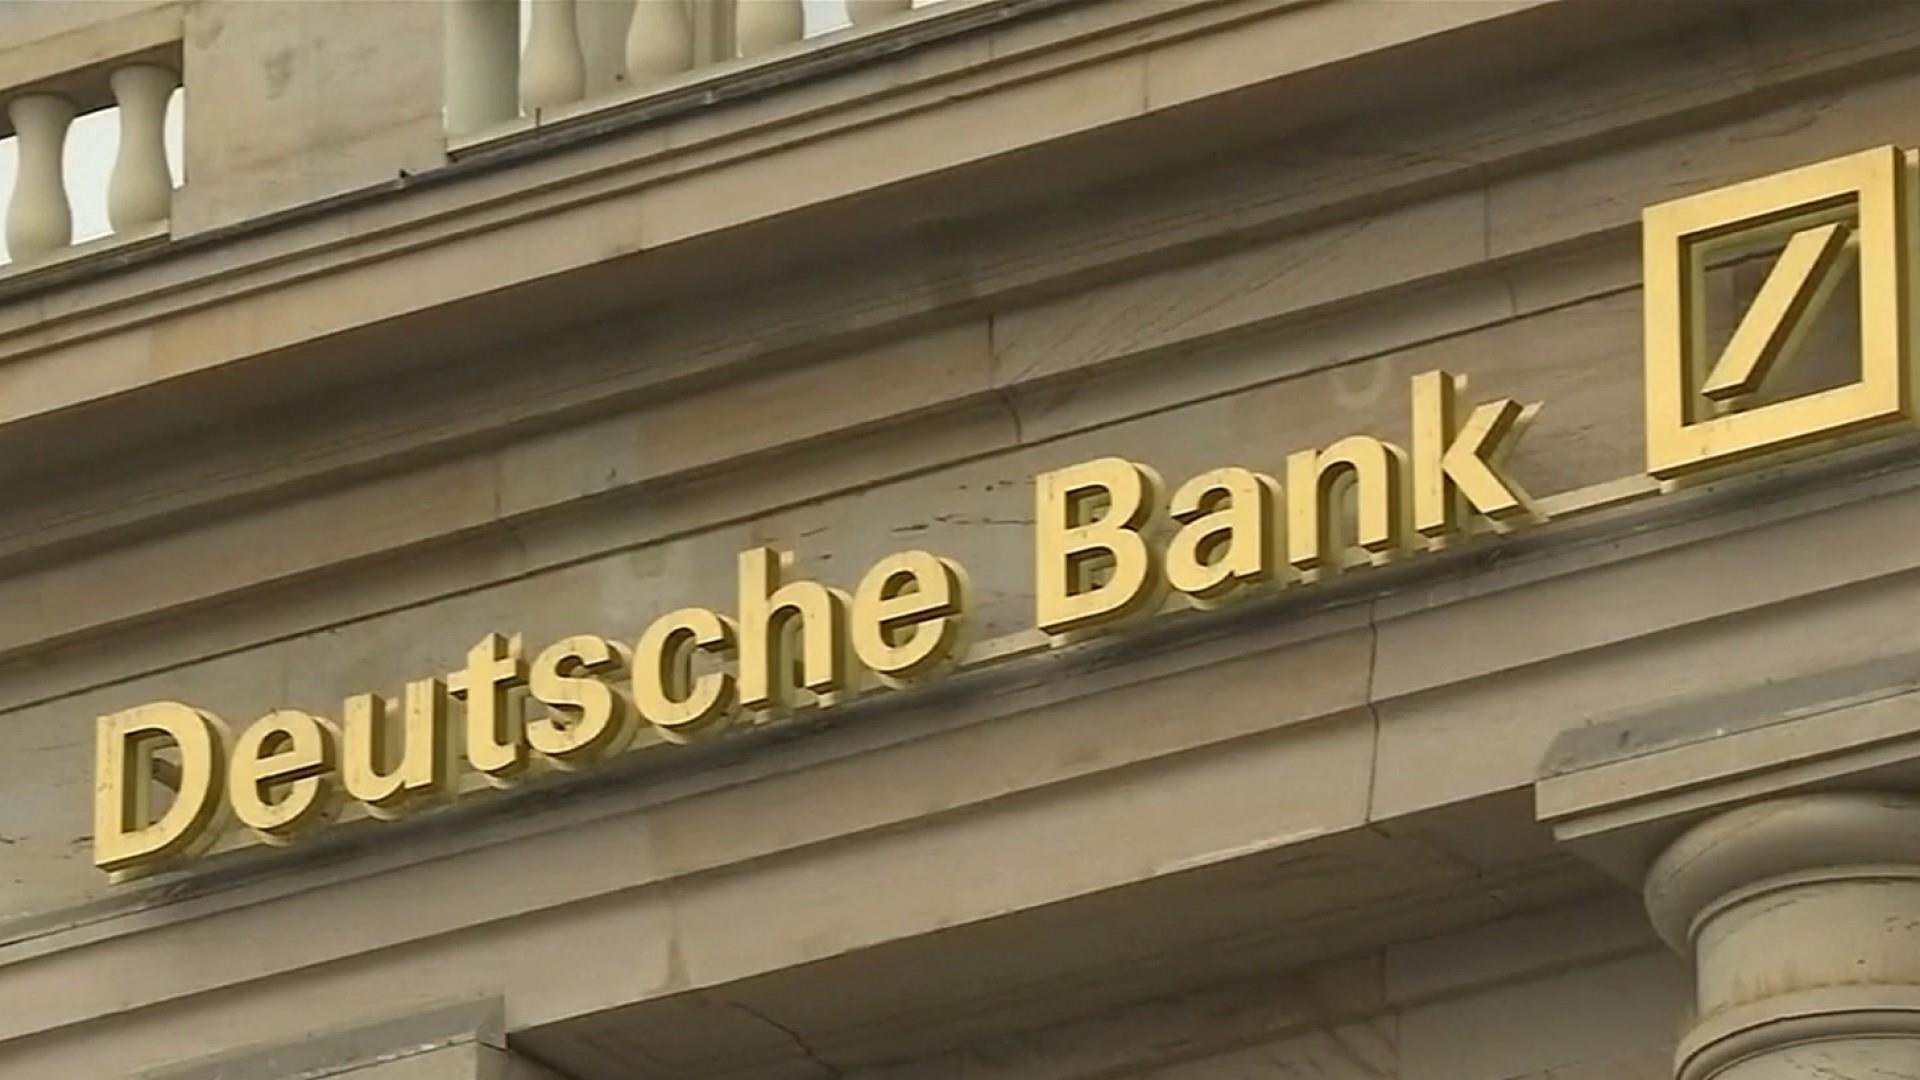 President Trump & his extensive connections to Deutsche Bank